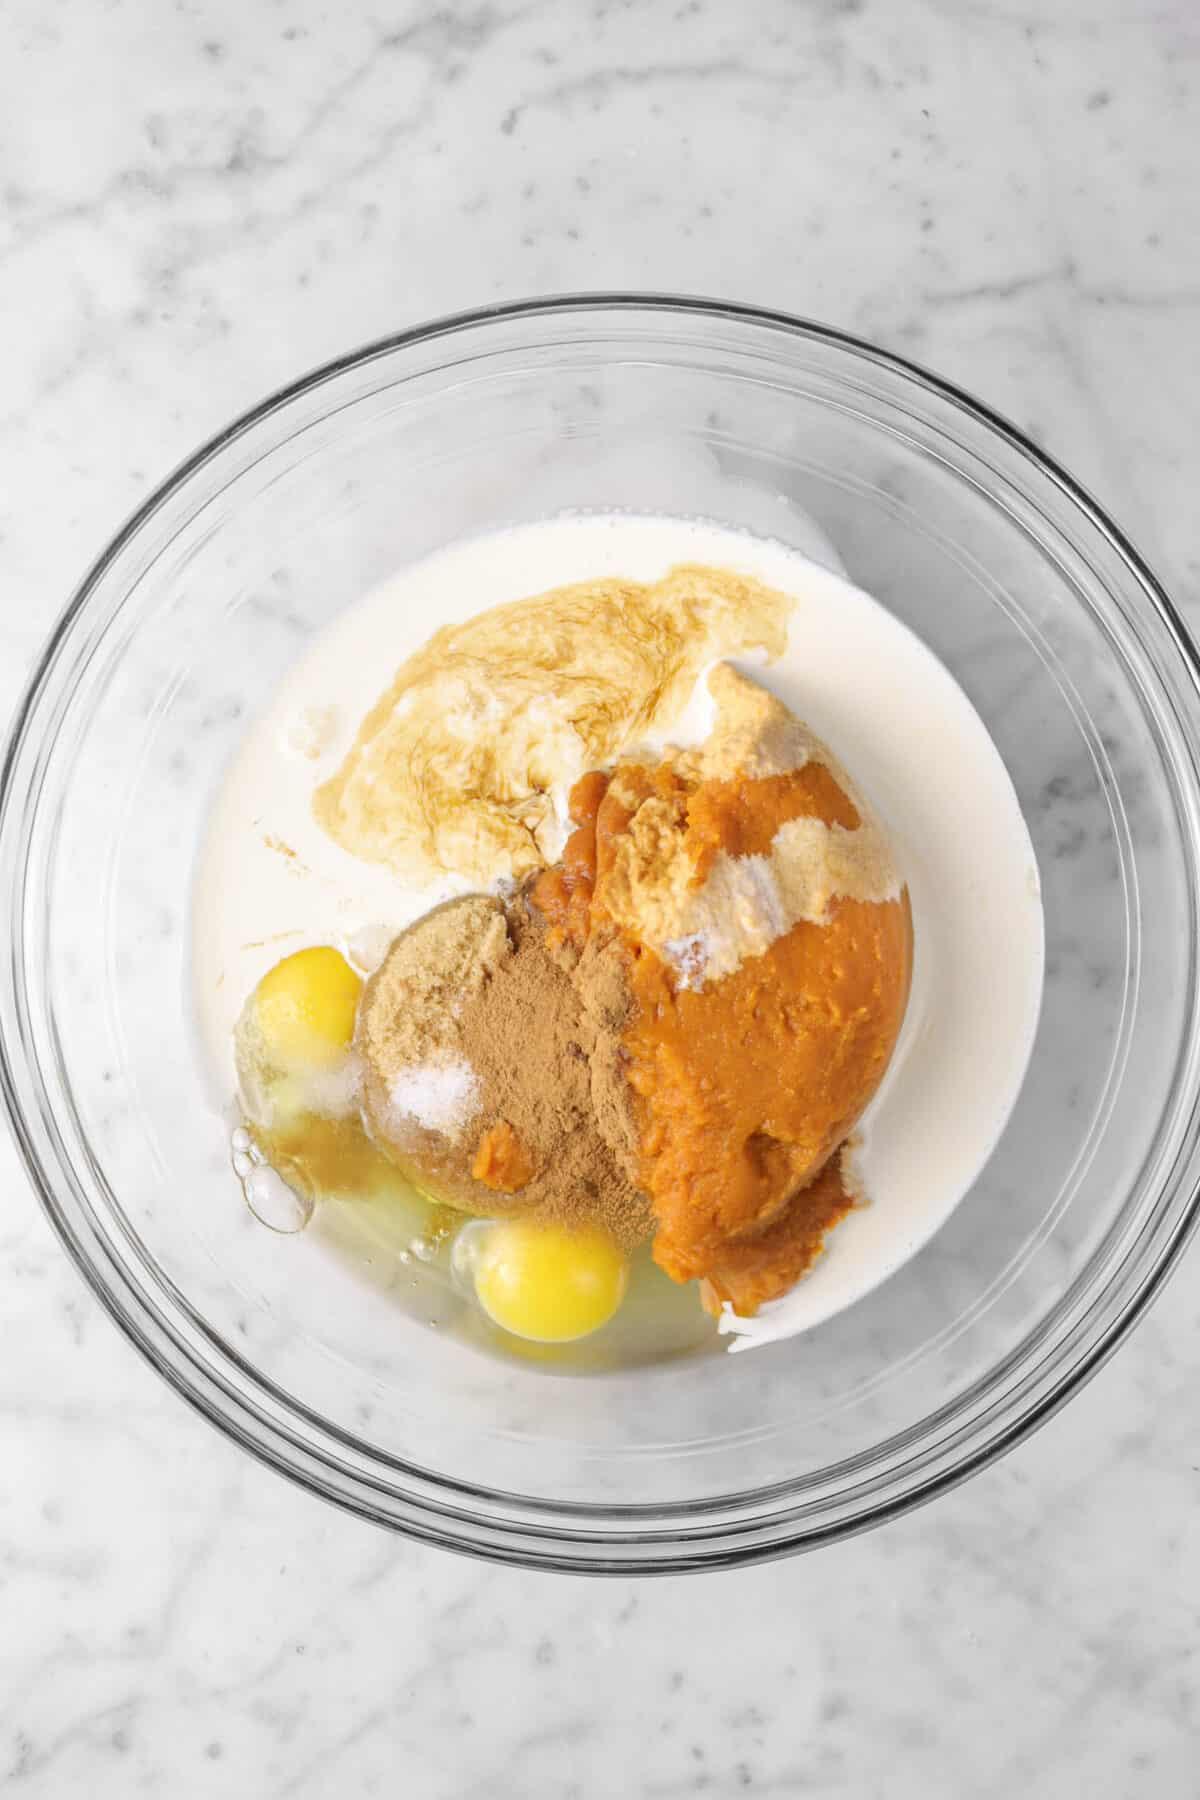 pumpkin, eggs, spice, heavy cream, brown sugar, and vanilla in a glass bowl